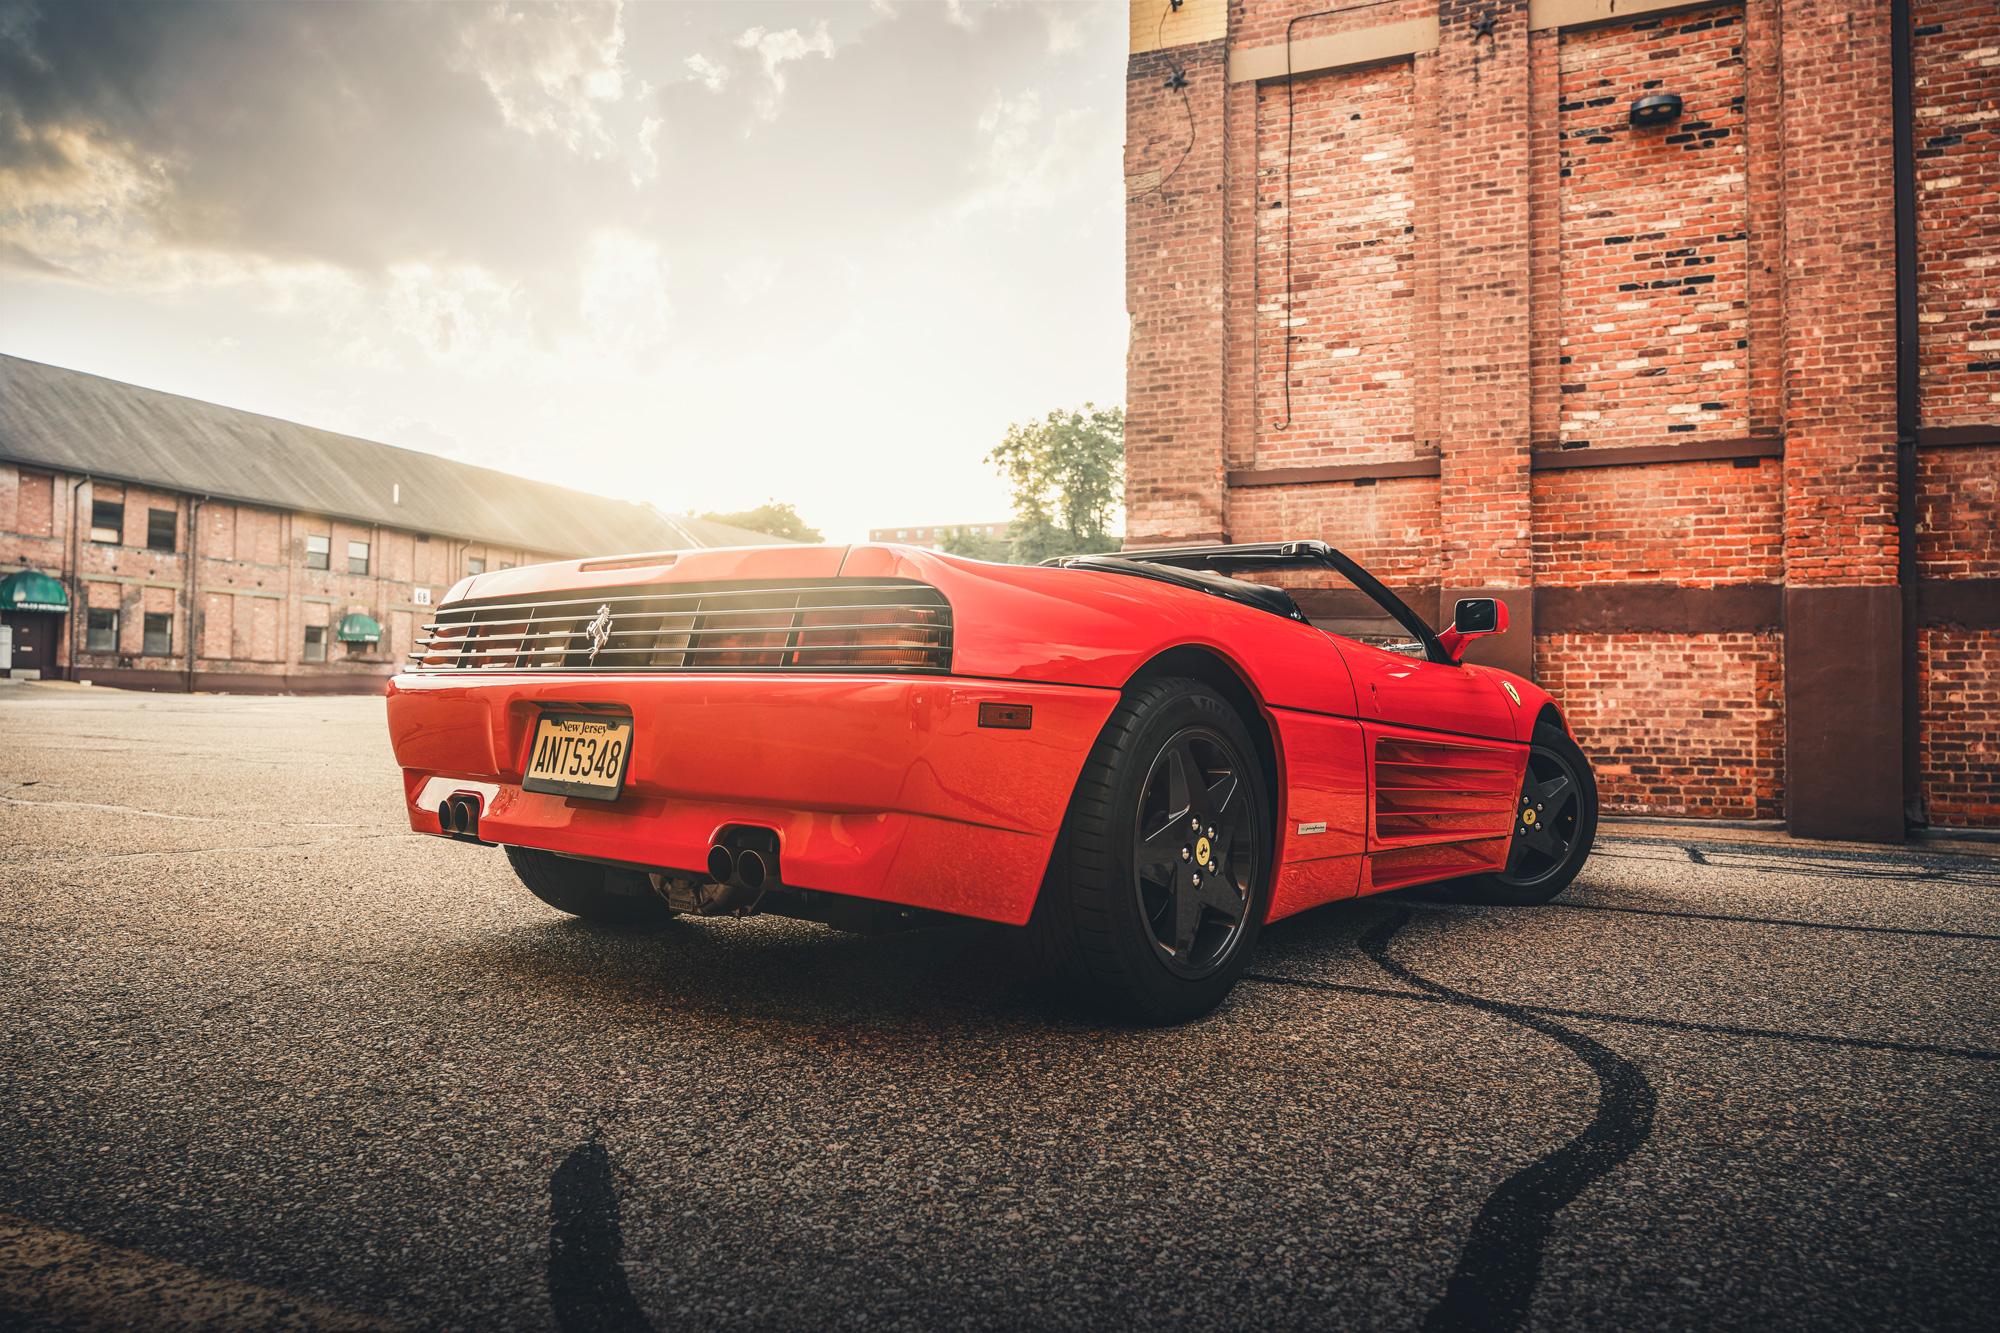 Ferrari 348 sunset